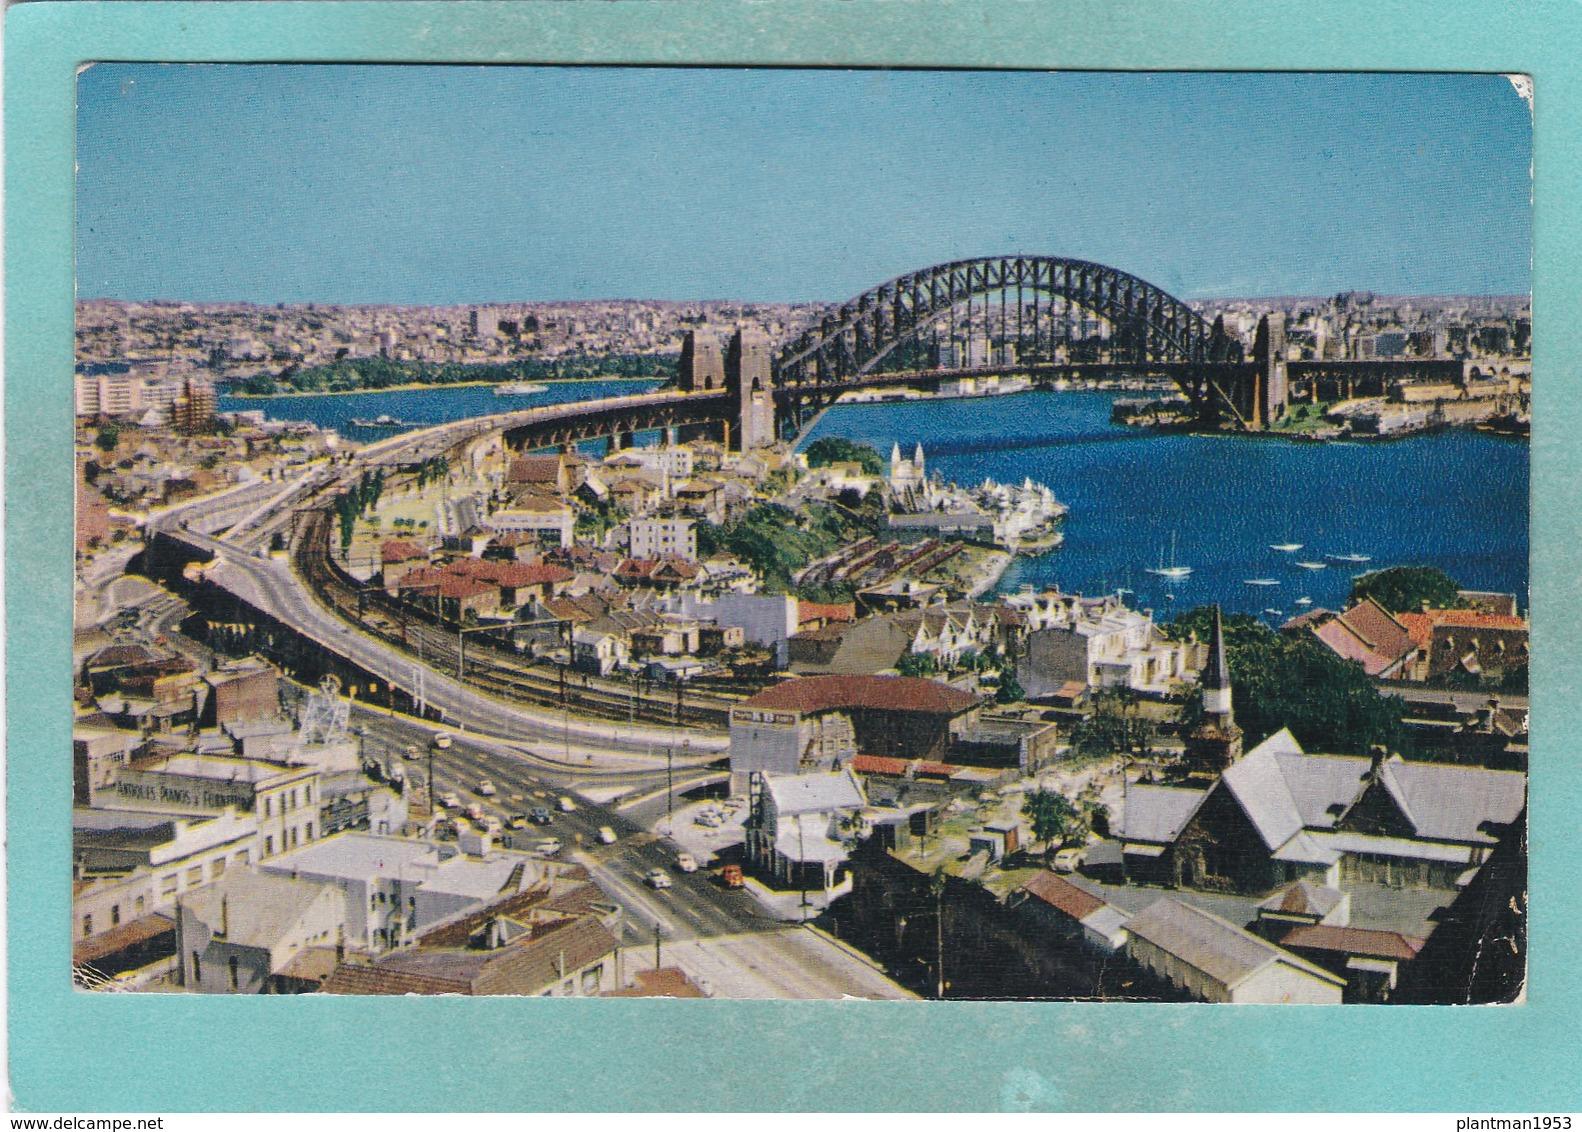 Small Post Card Of Harbour Bridge,Sydney,New South Wales, Australia.,V103. - Sydney